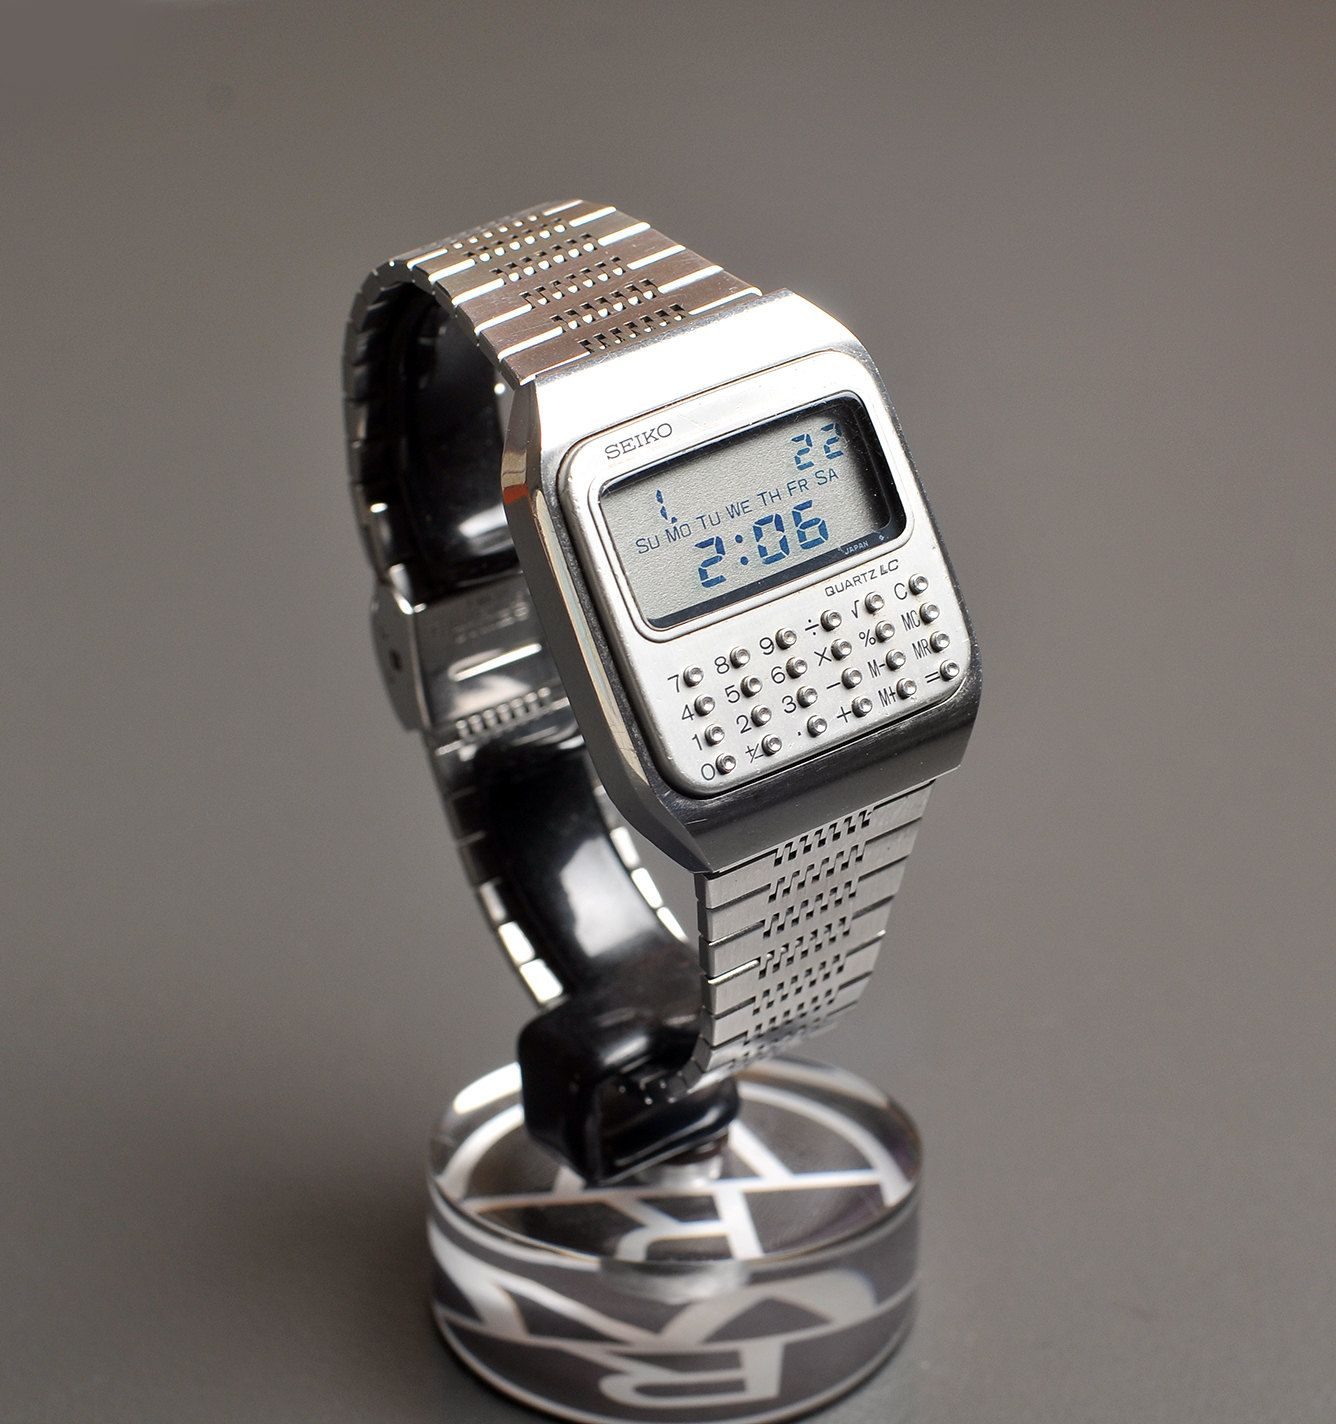 b5785ebad37e vintage Seiko C153 5007  vintage calculator watch  rare futuristic ...